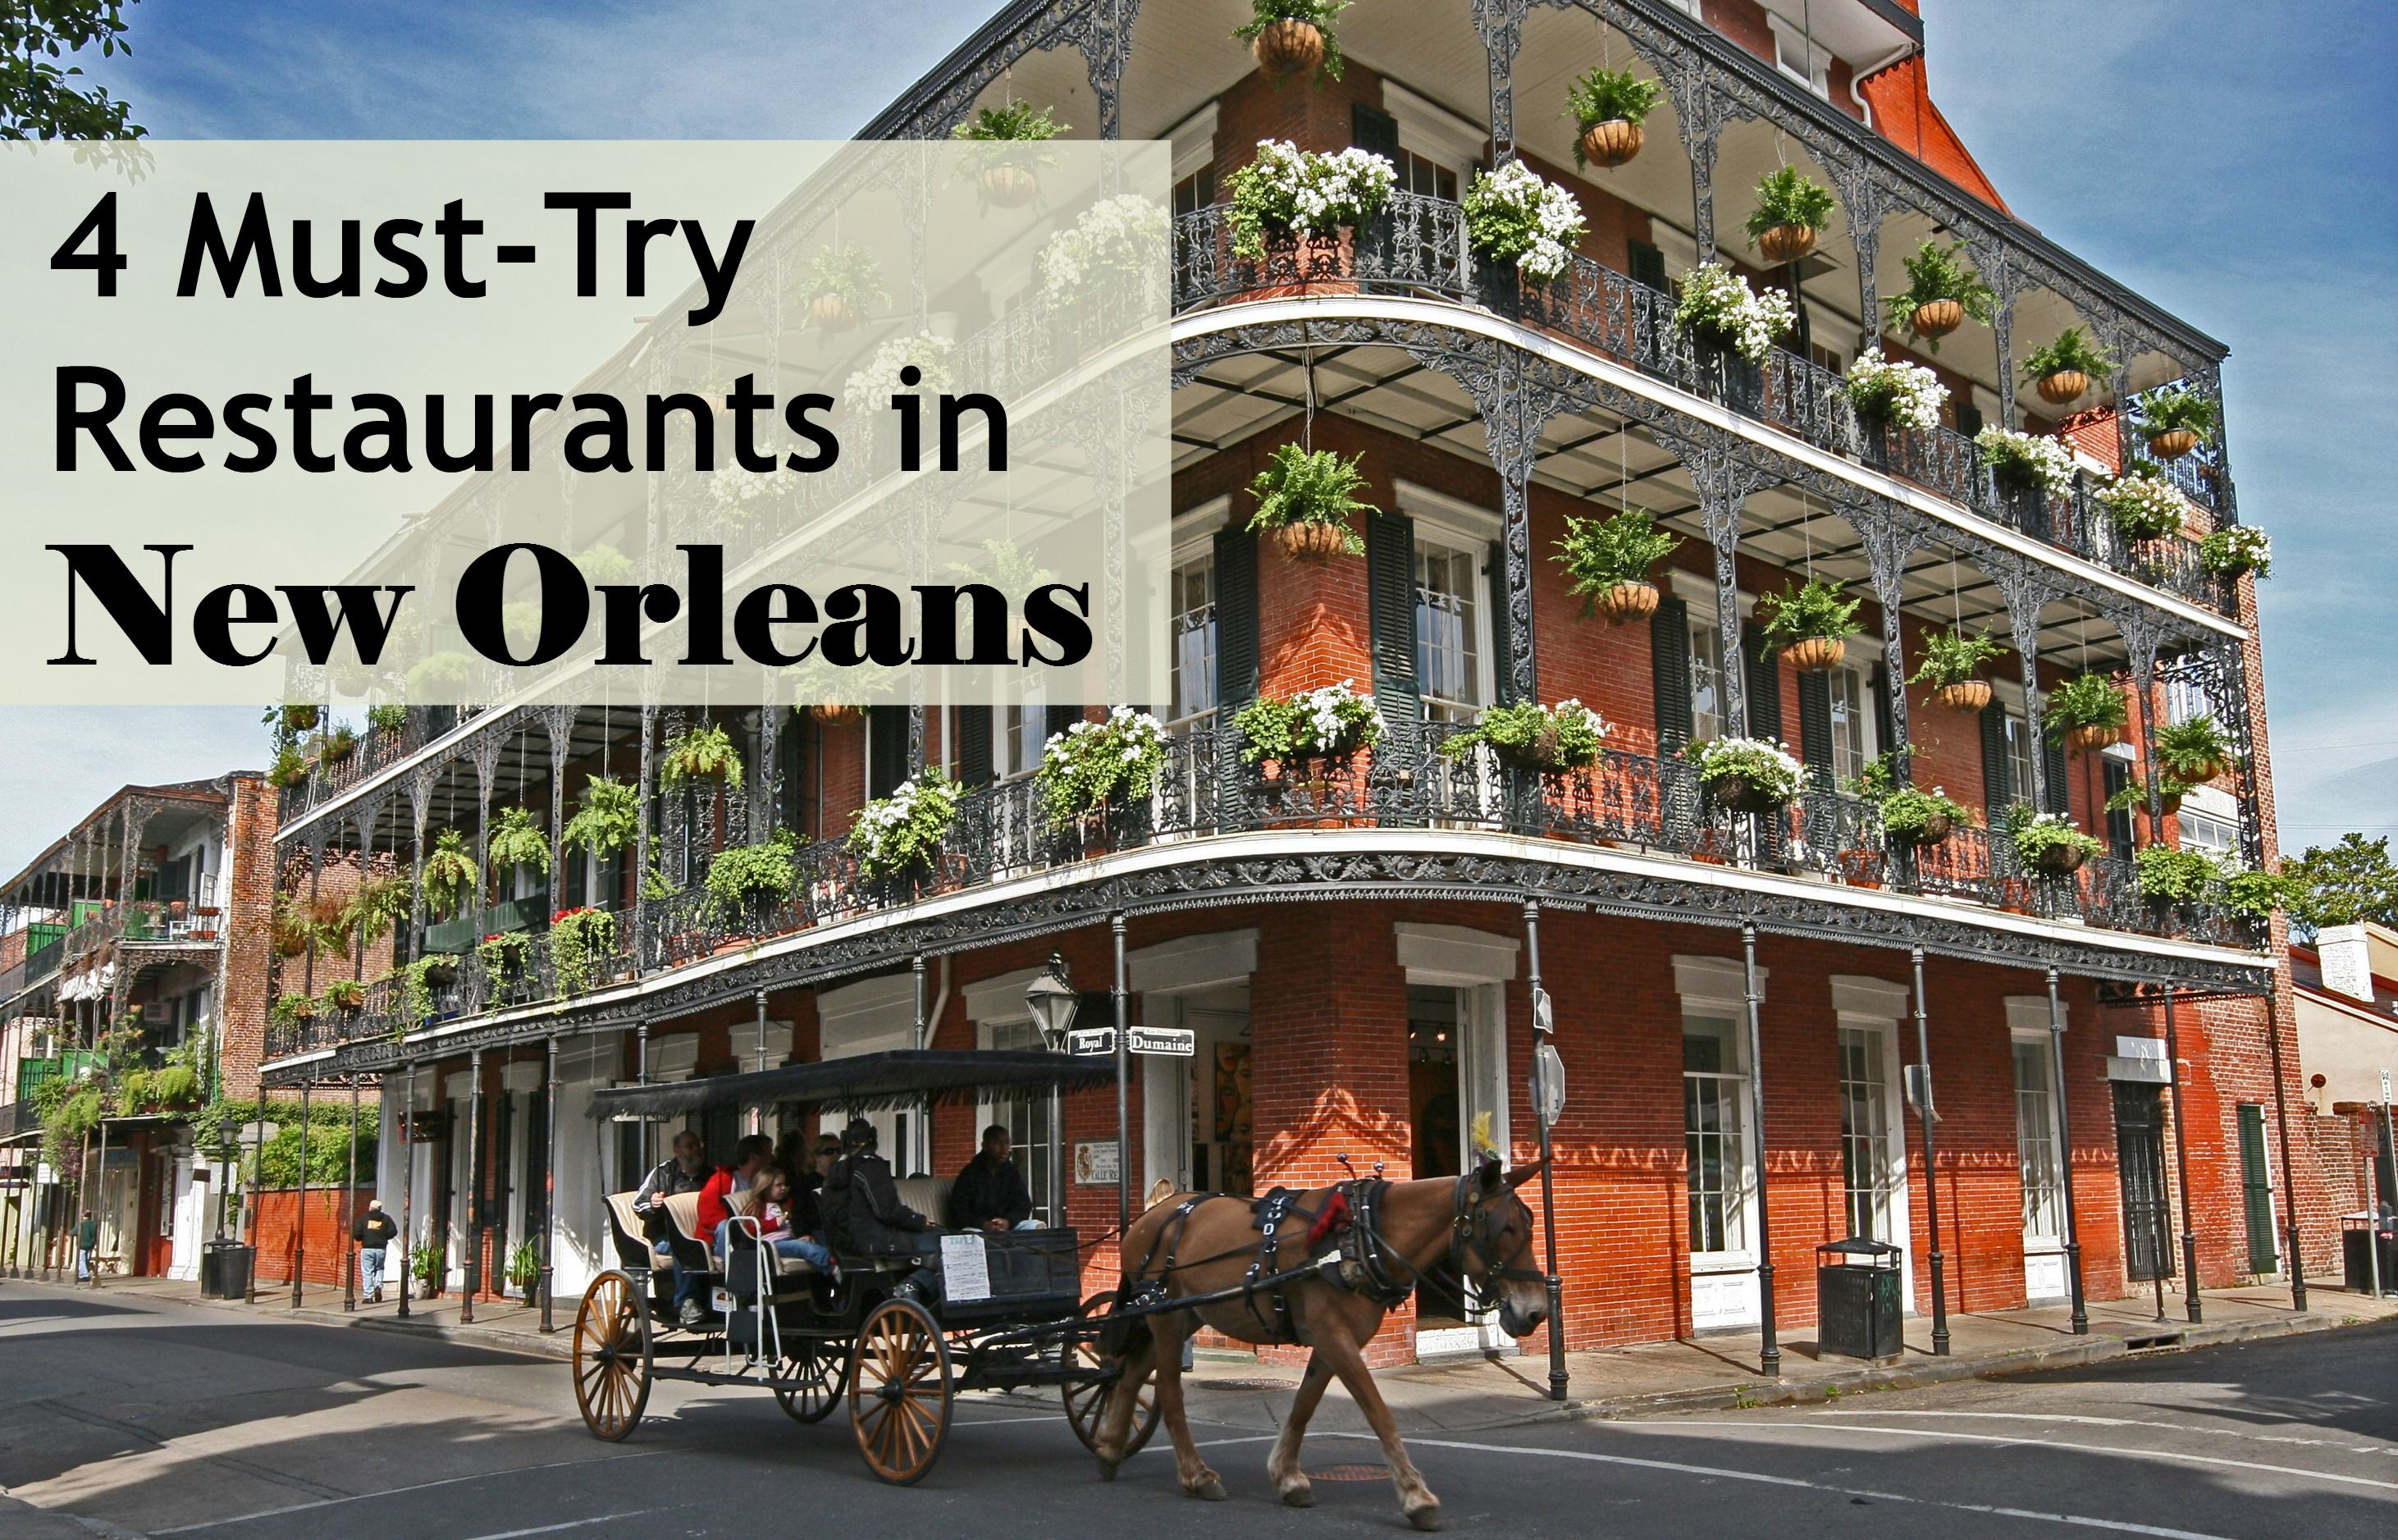 4 Must-Try New Orleans Restaurants